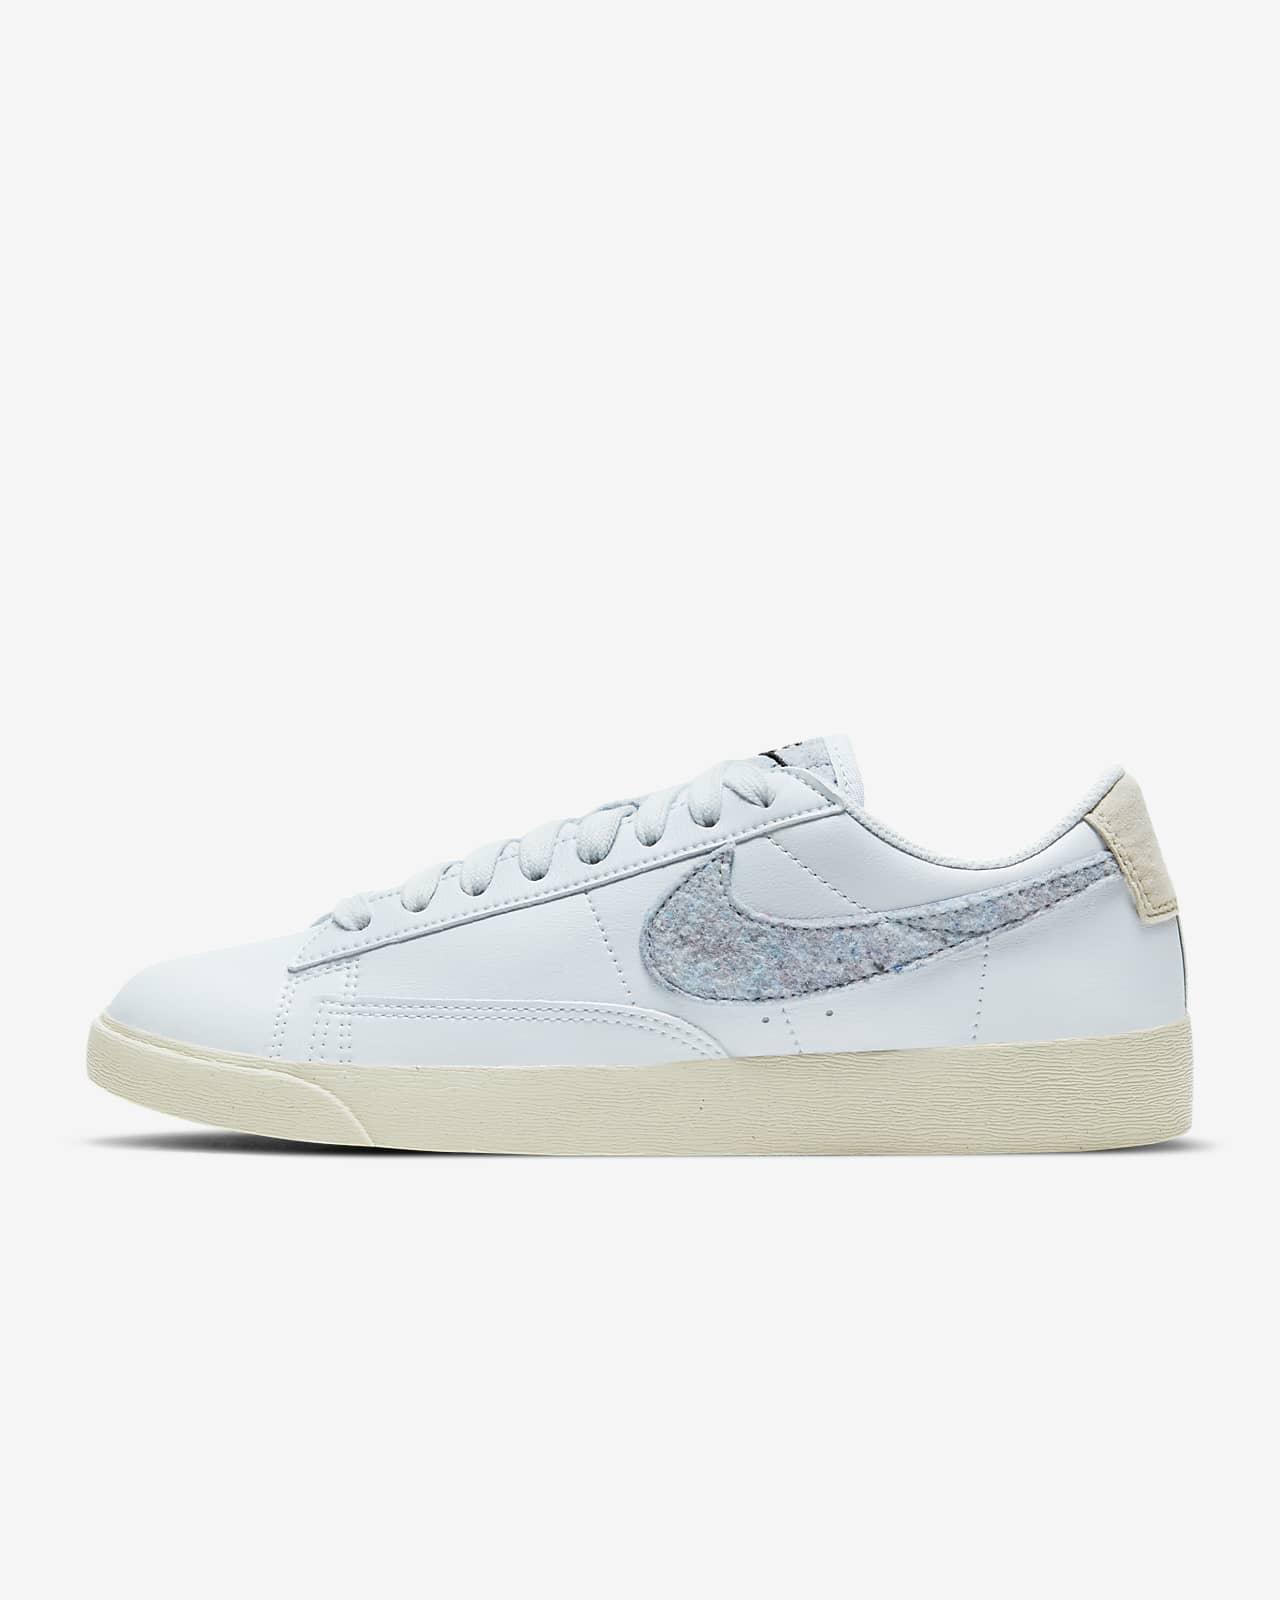 Nike Blazer Low SE Damenschuh